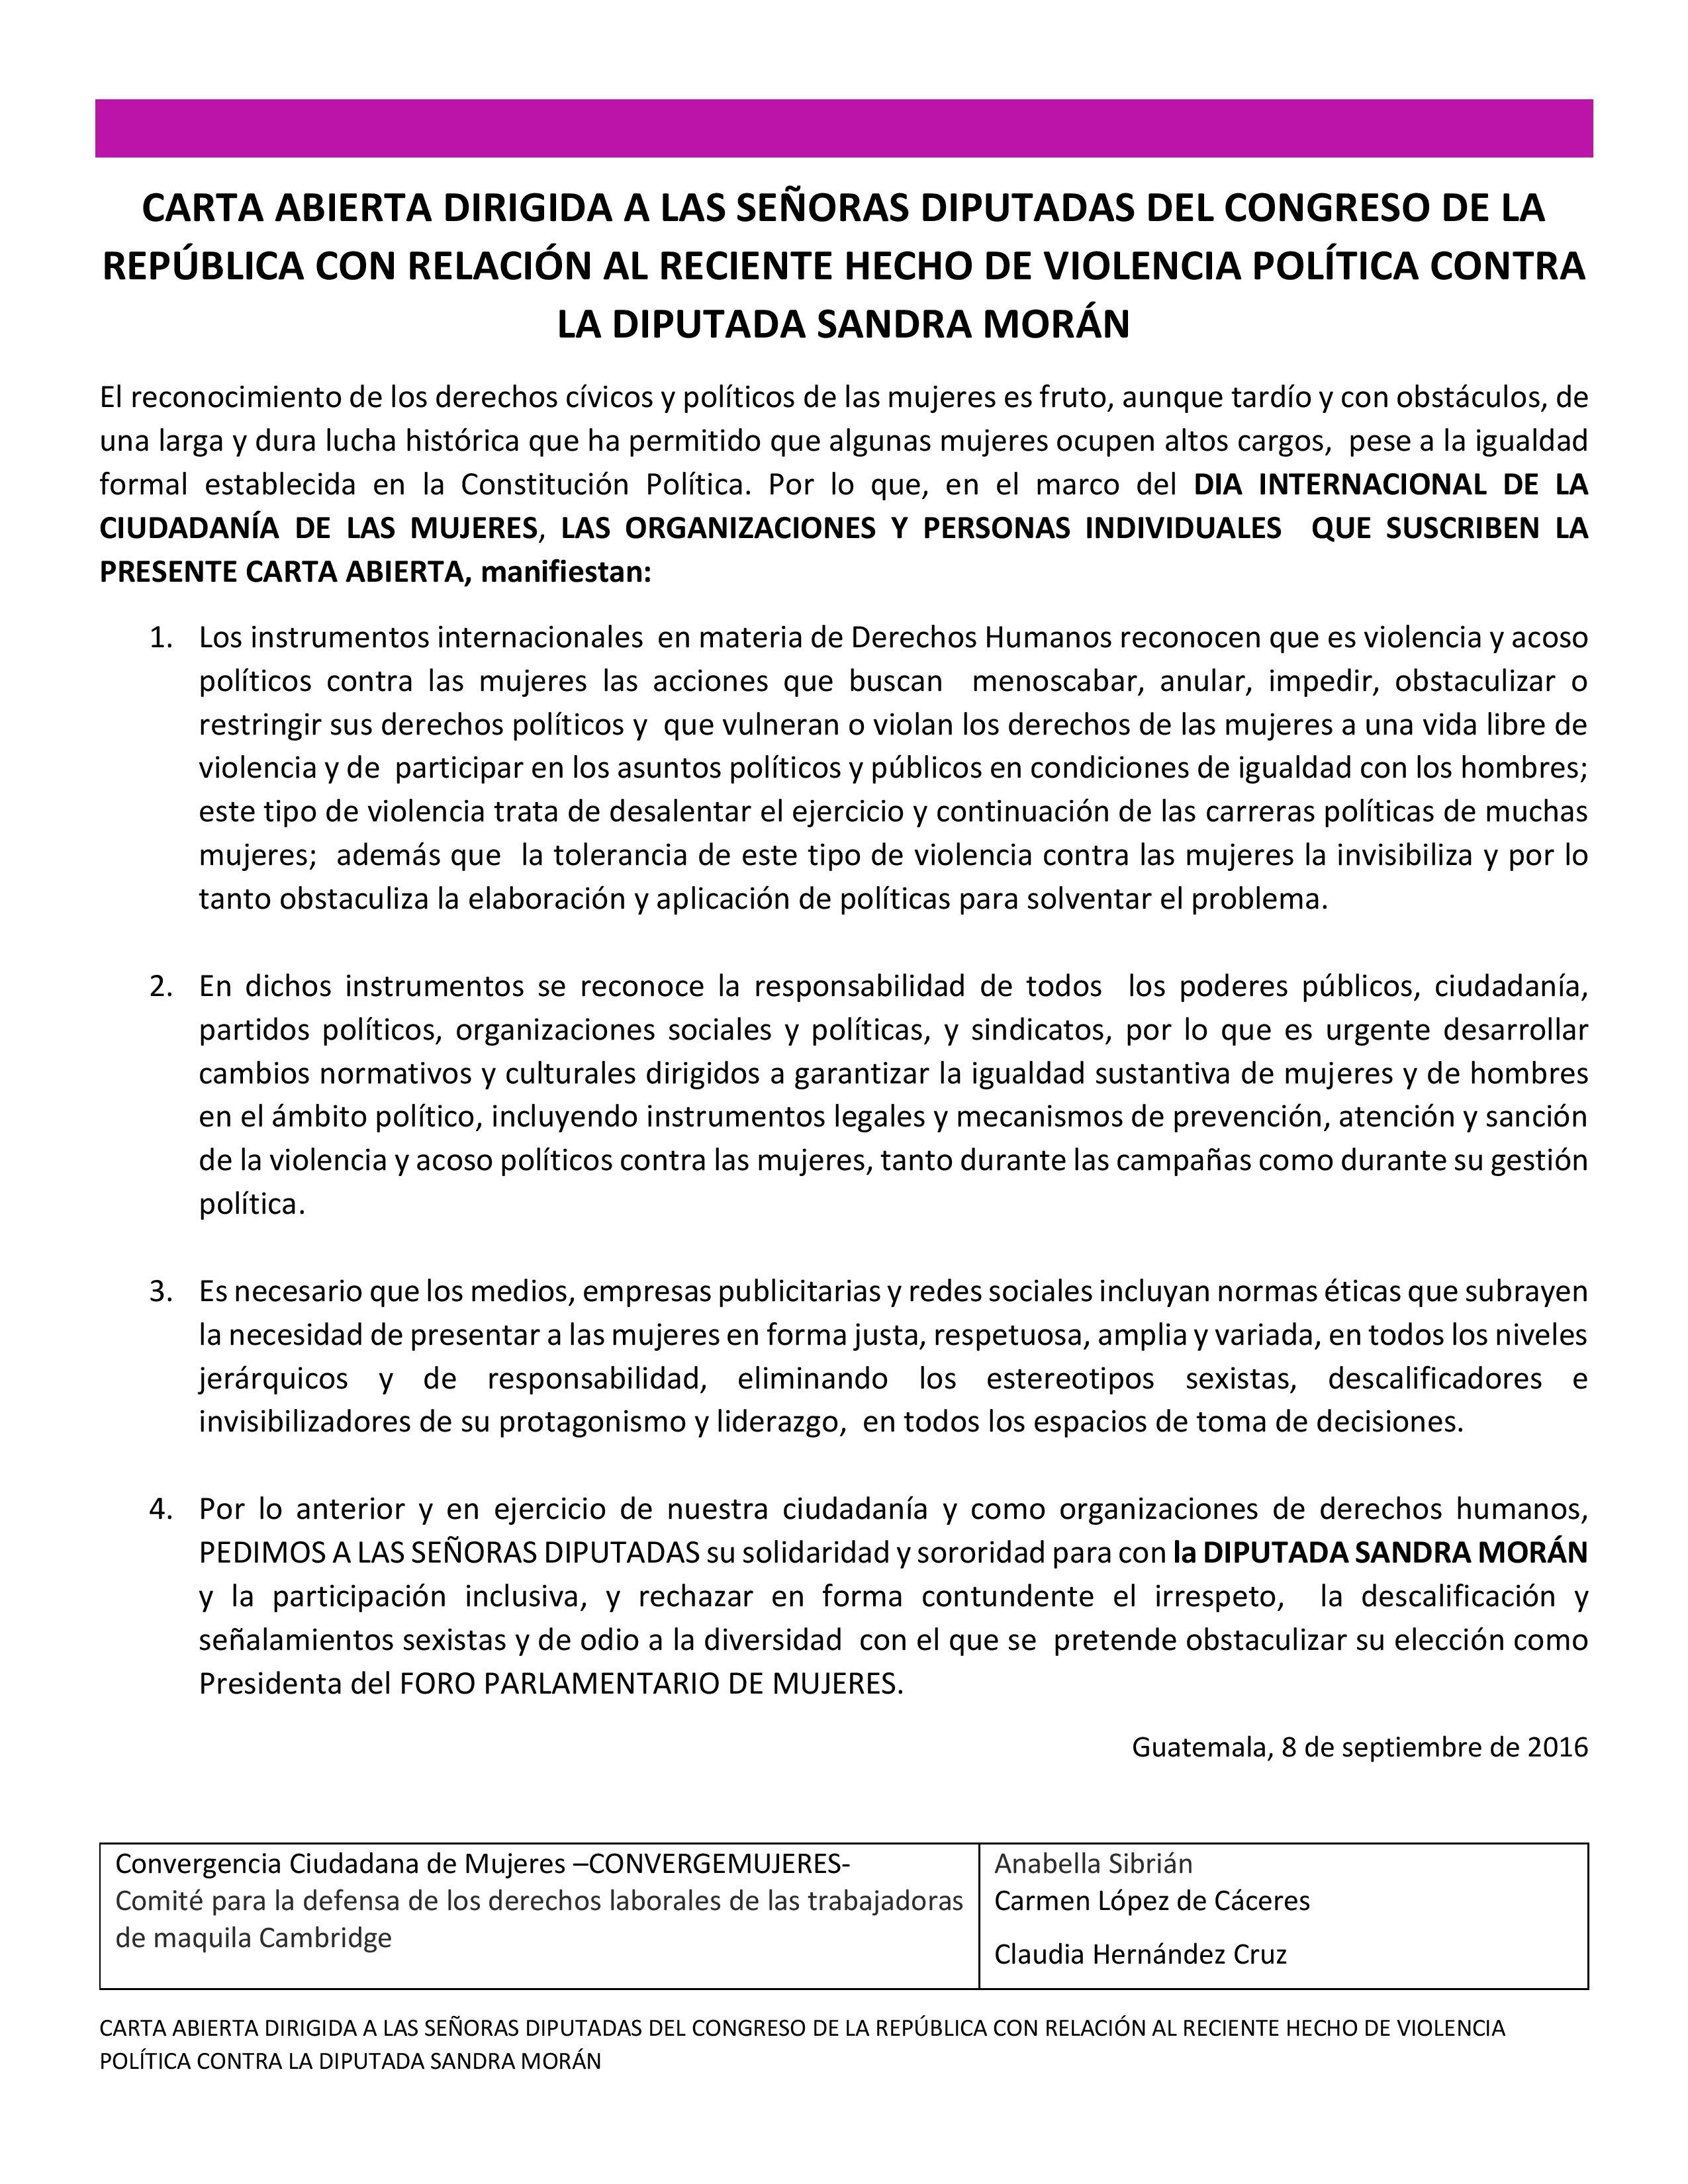 violencia-c-diputada-sandra-moran-08-09-16-publicada-page-001 ...